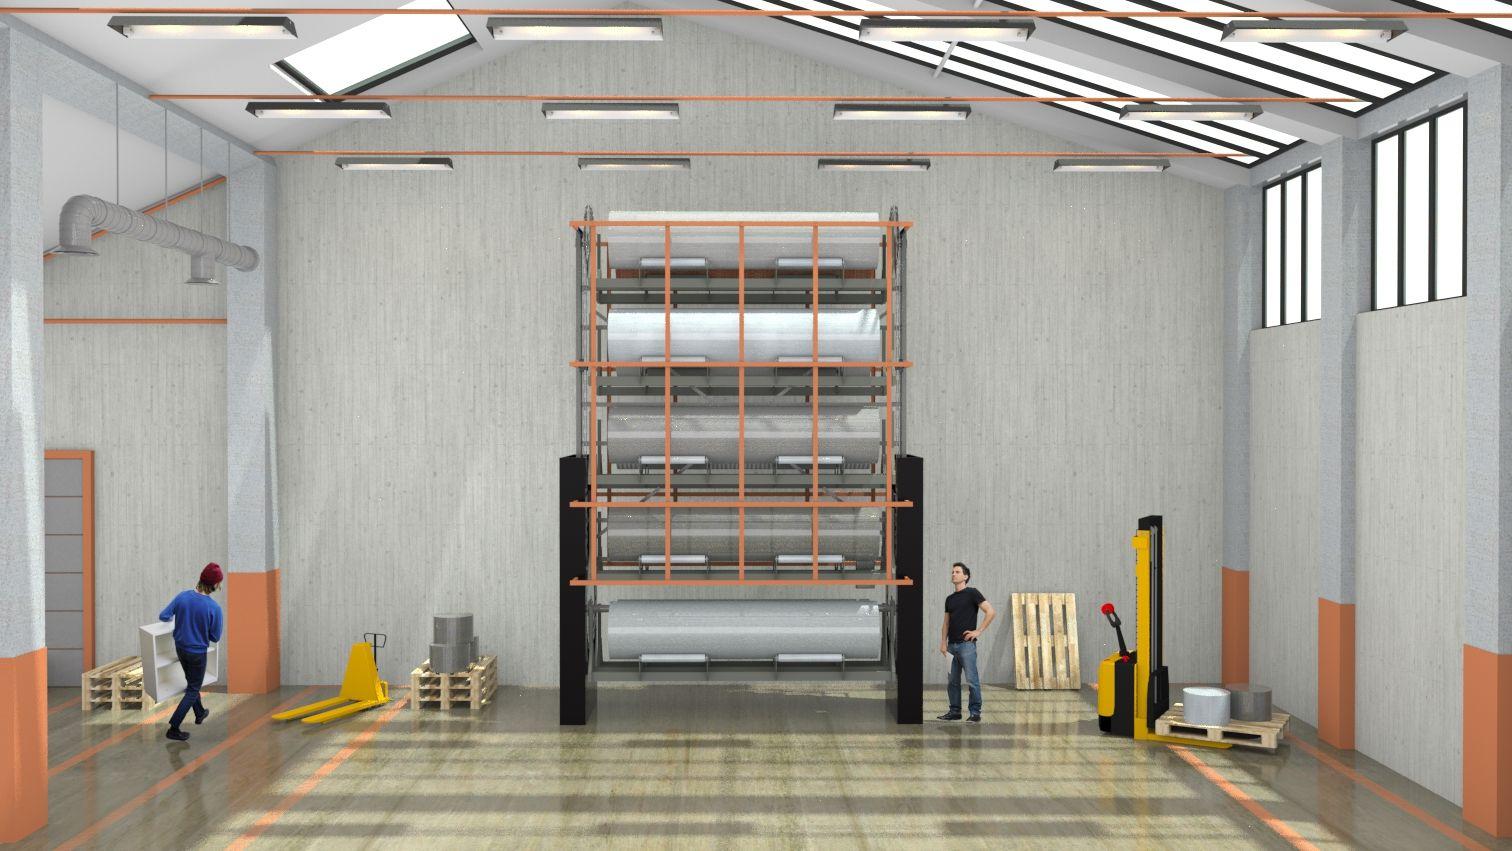 Stockage vertical automatique